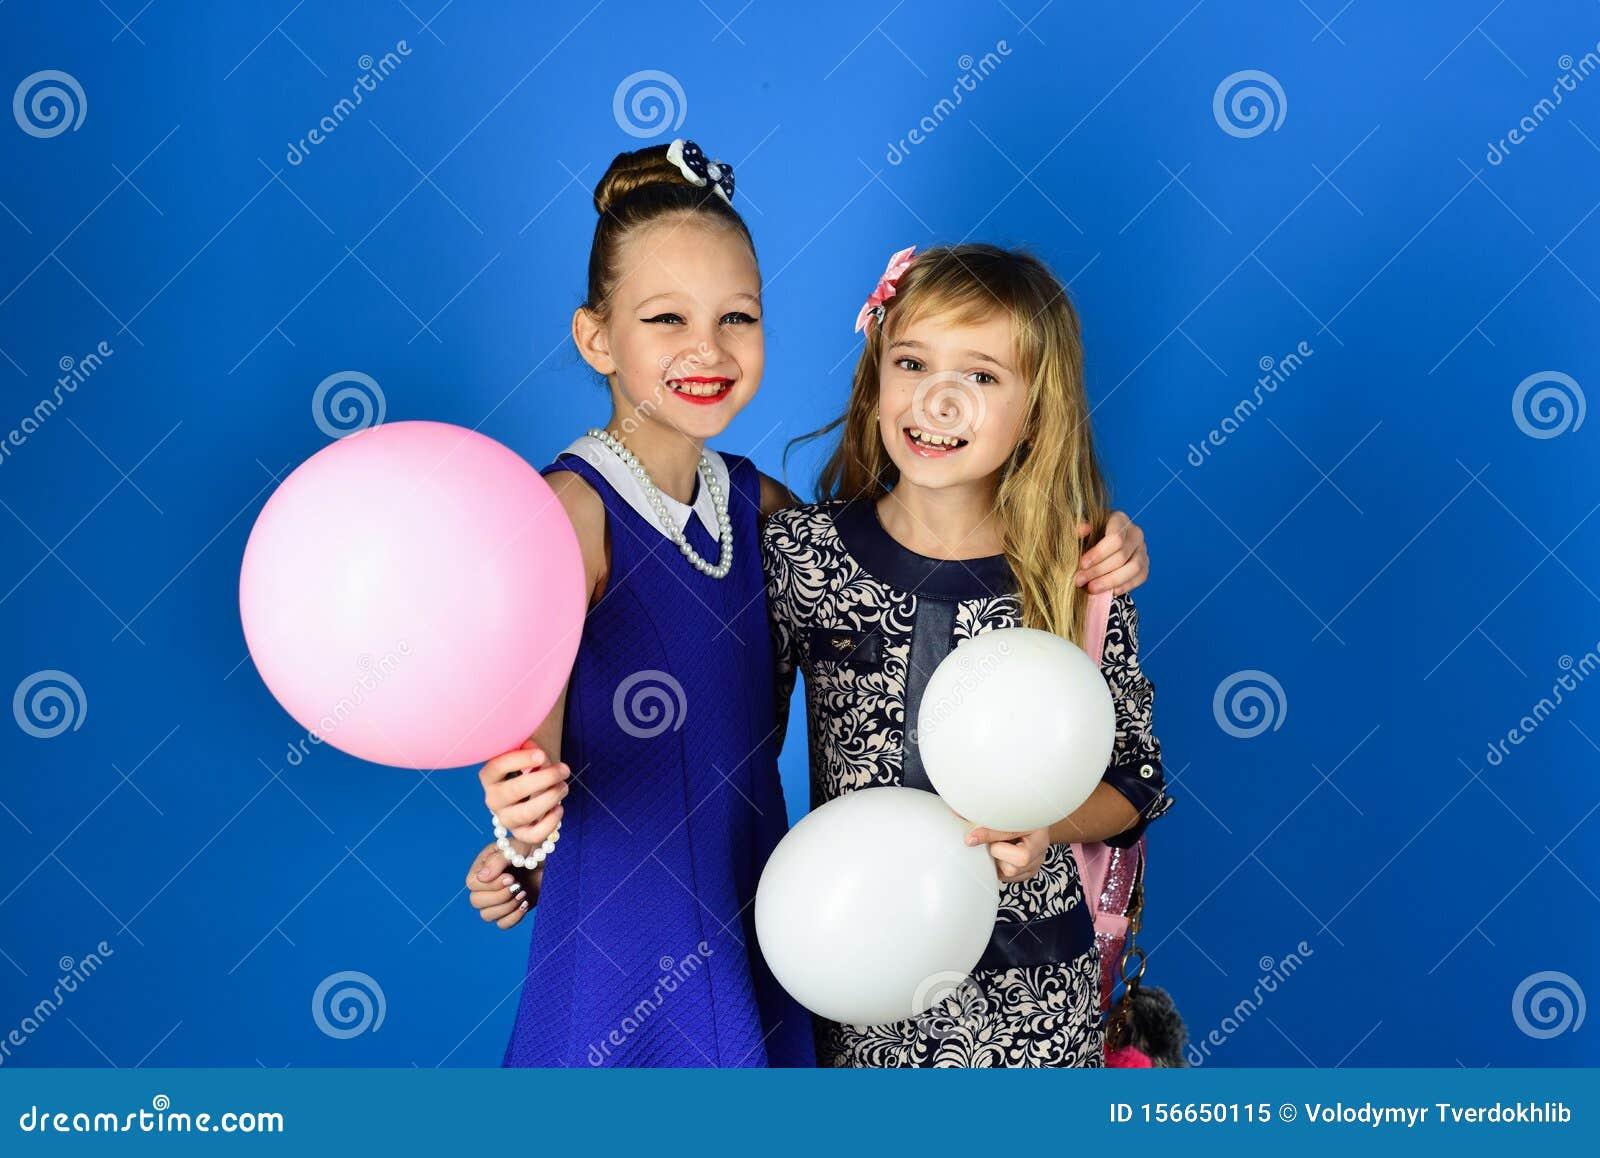 Fashion and beauty, little princess. Family fashion model sisters, beauty. Little girls in fashionable dress, prom